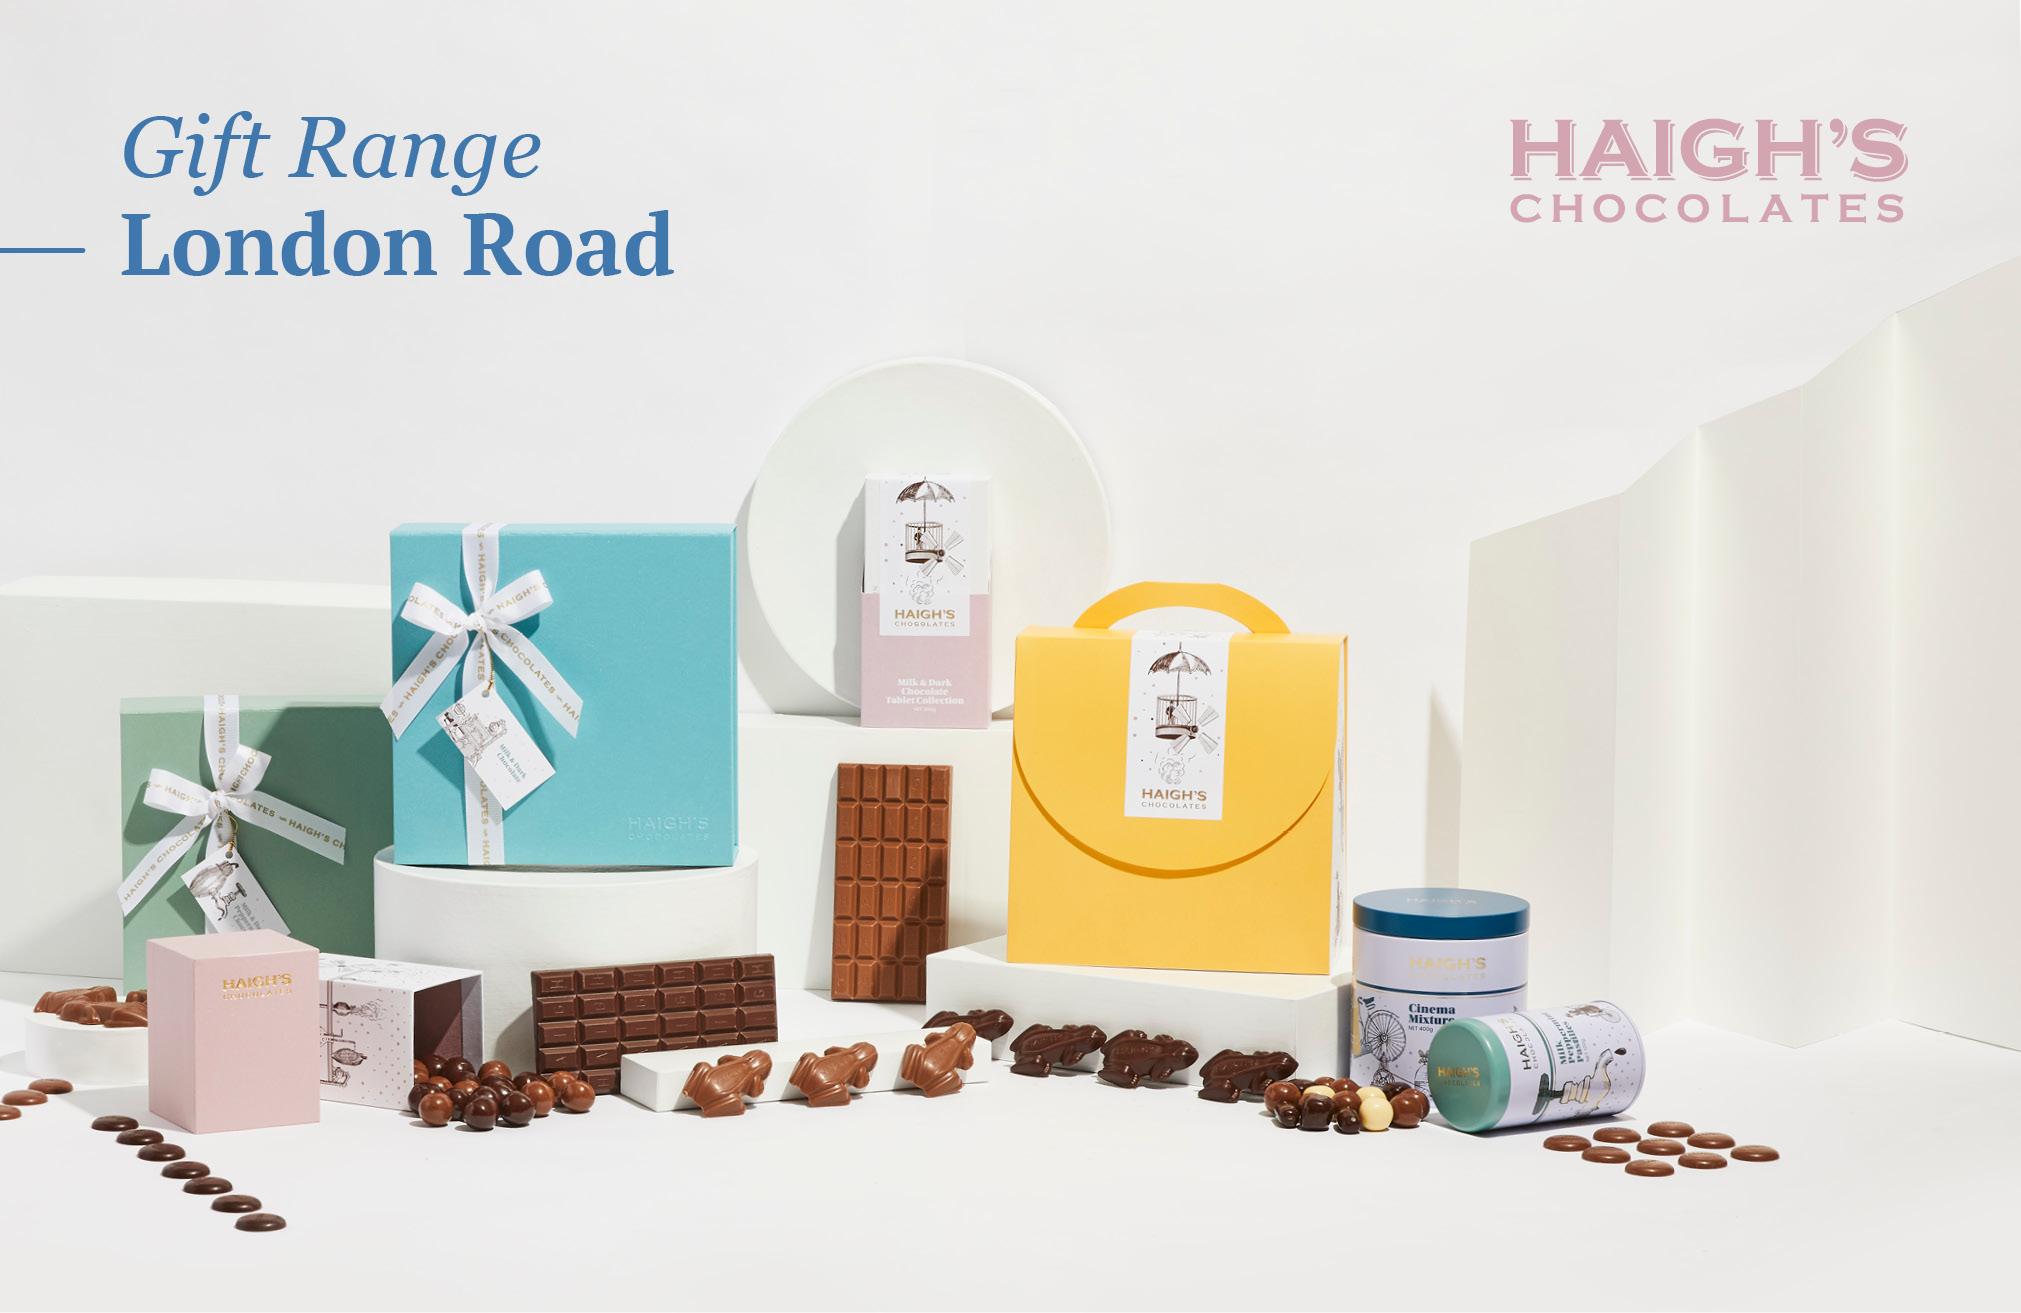 Haigh's Chocolates: New Gift Range - London Road